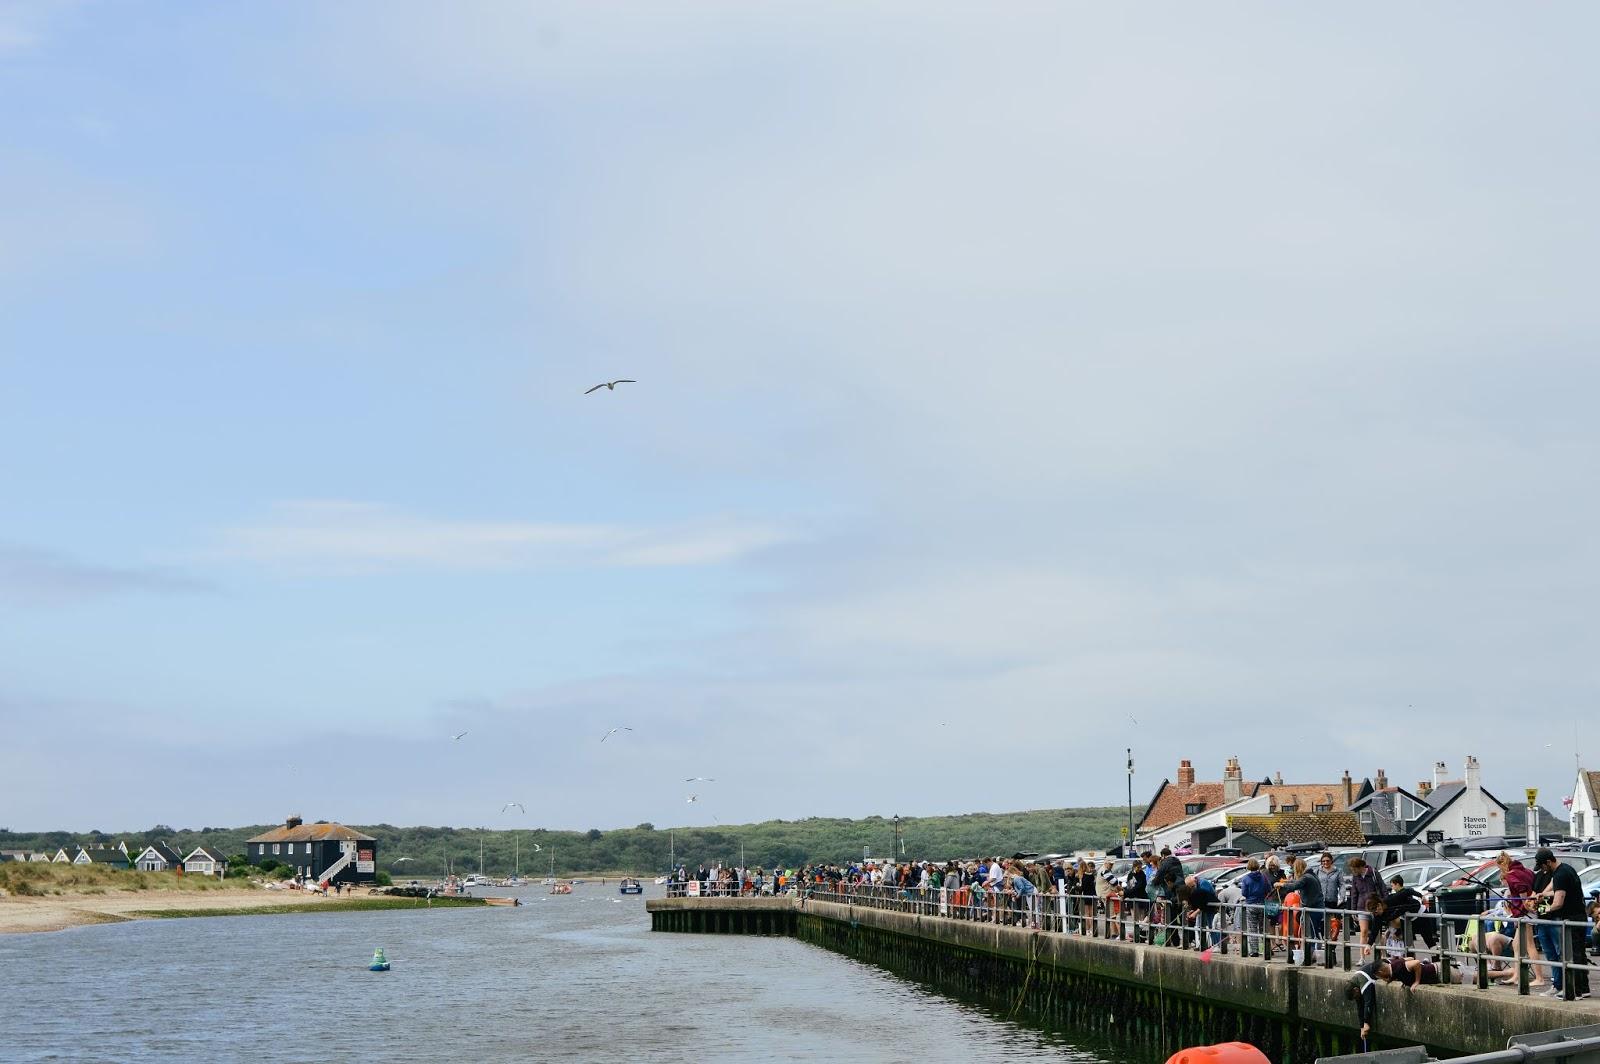 Mudeford Seafood Festival at Mudeford Quay